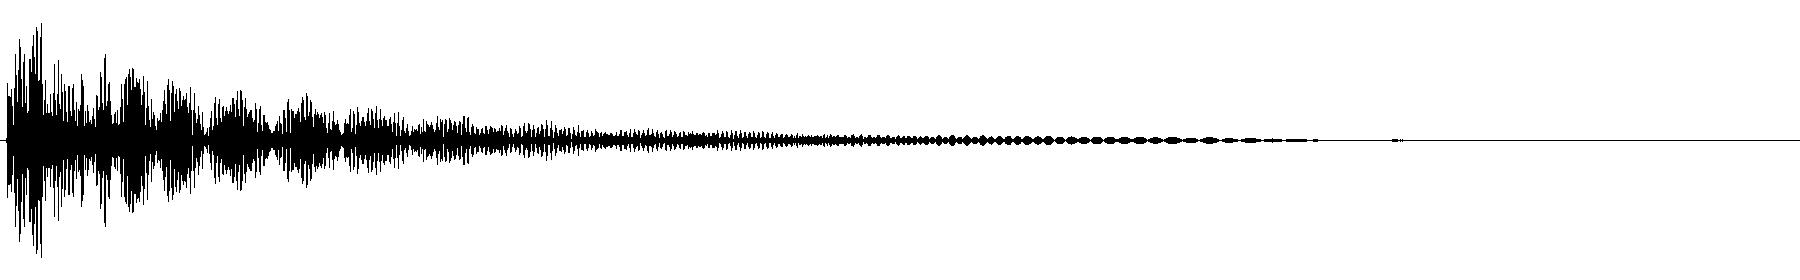 12zp01